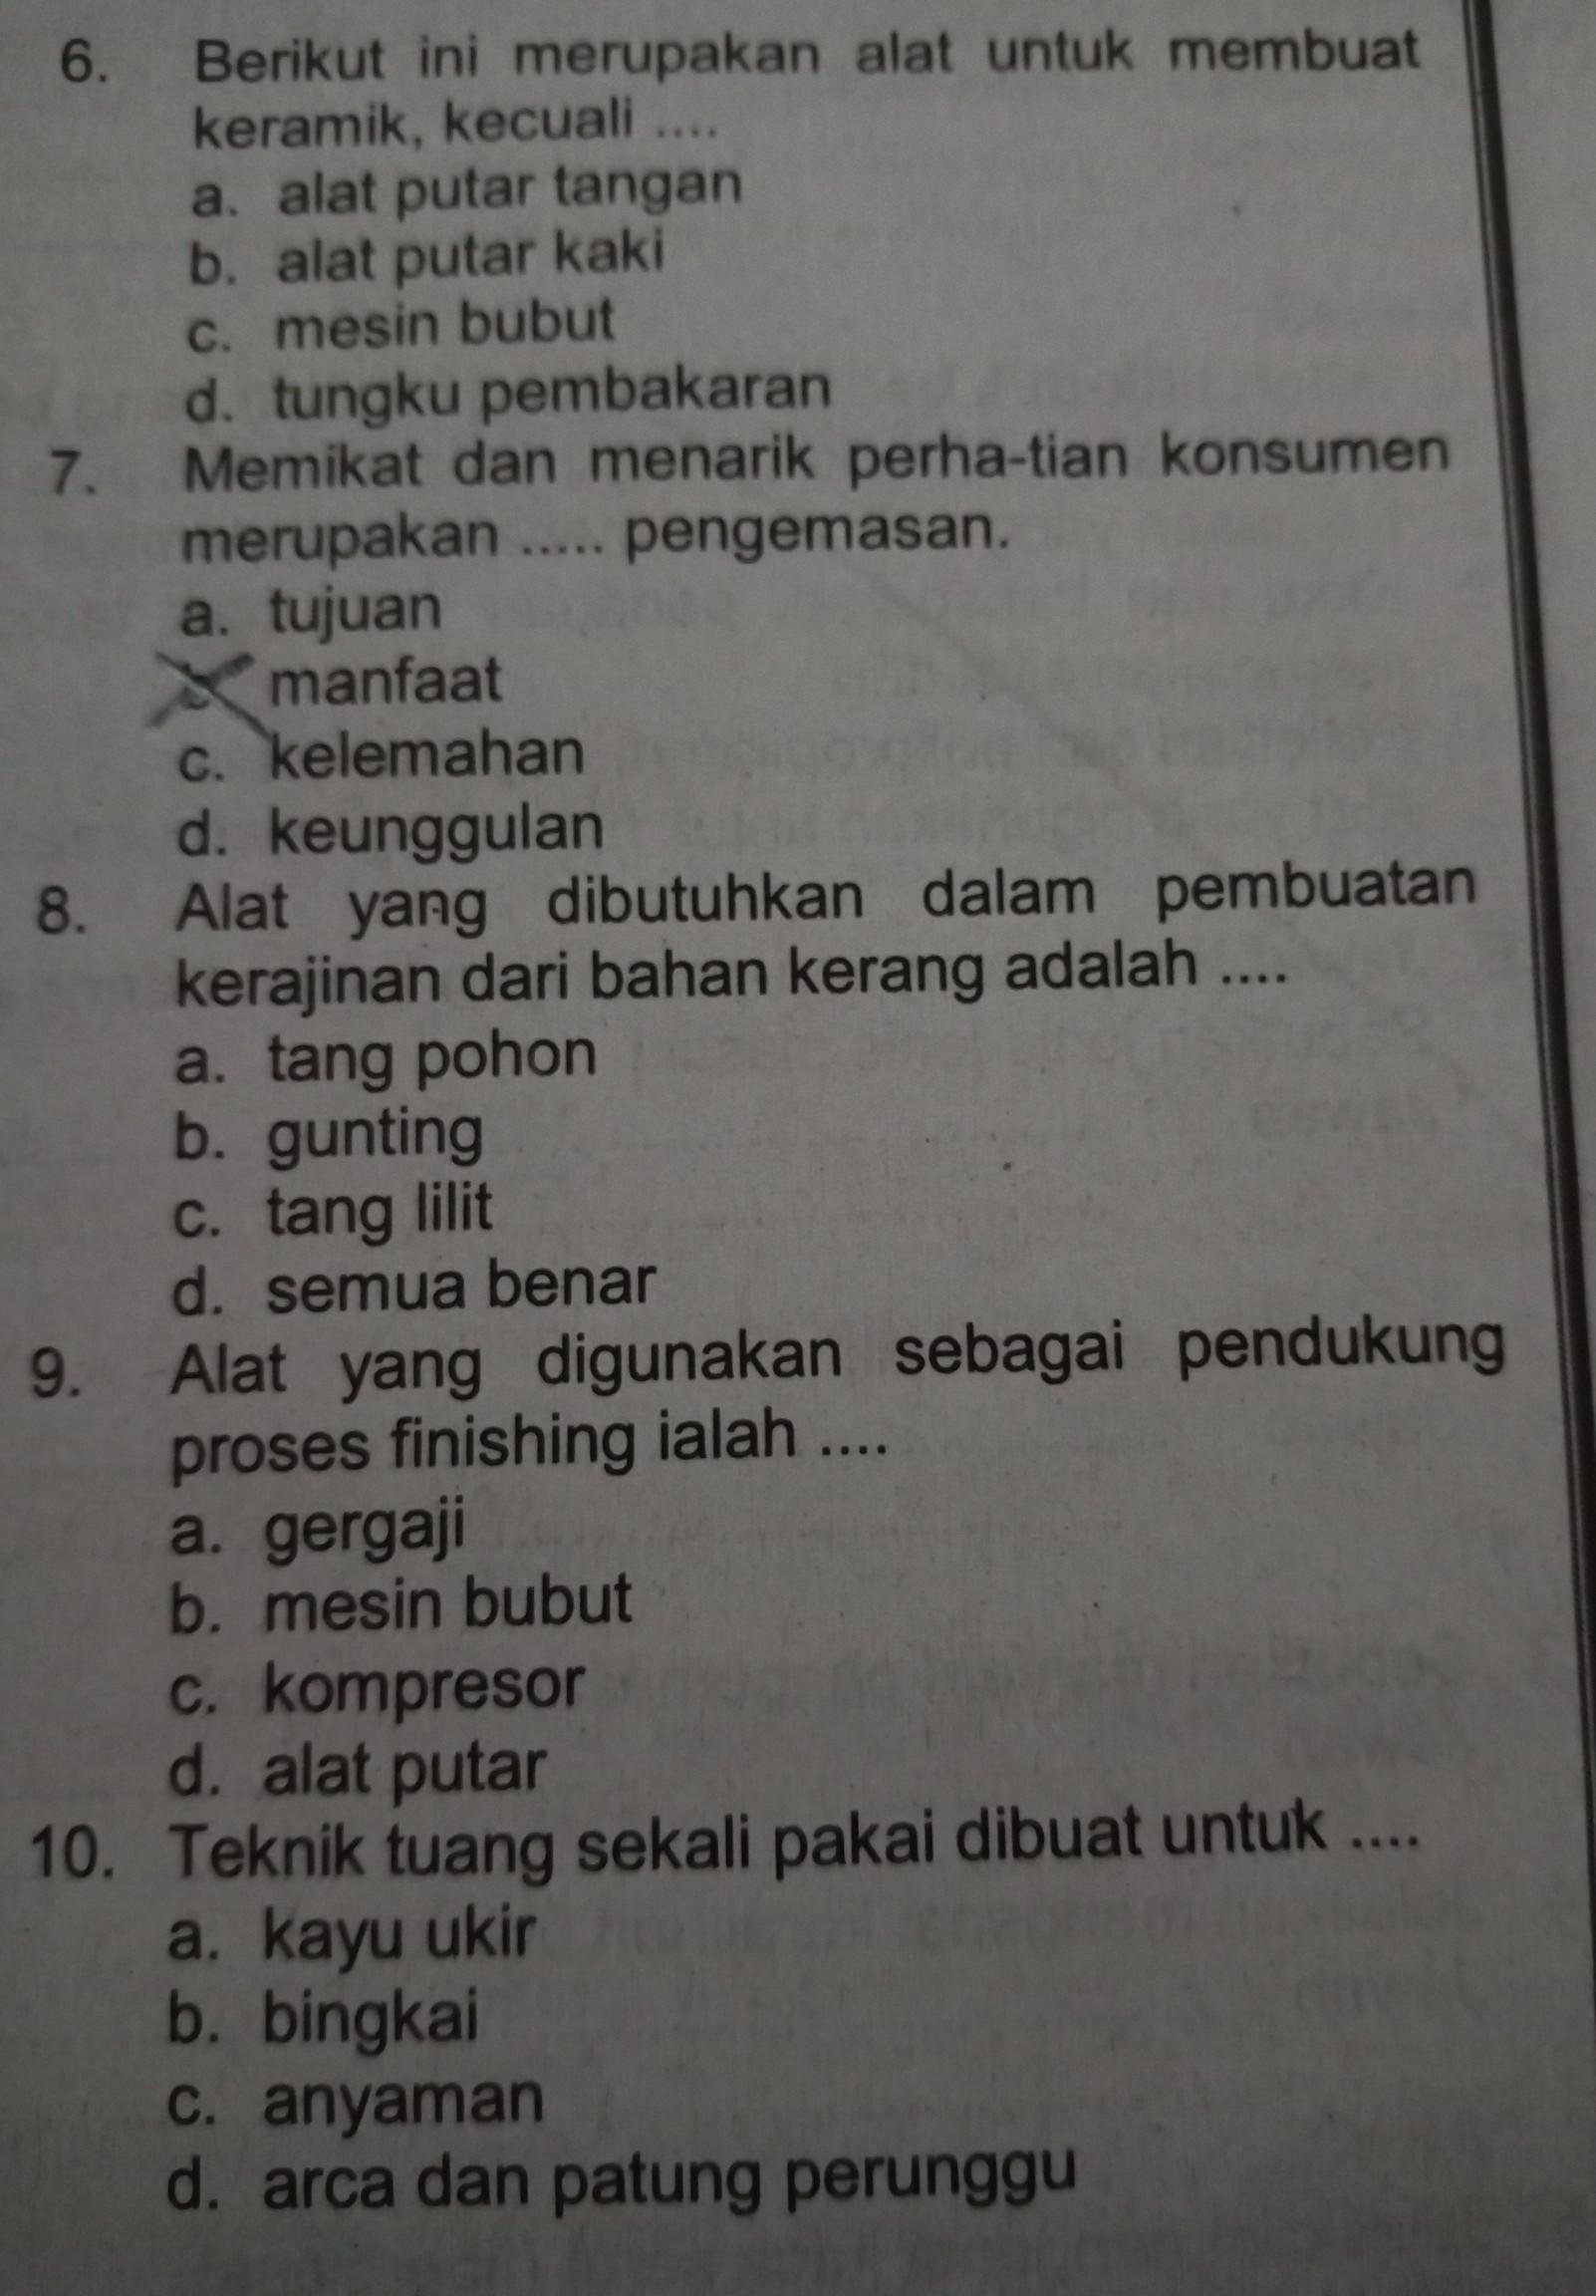 Kunci Jawaban Prakarya Kelas 8 Kurikulum 2013 - Guru Ilmu ...